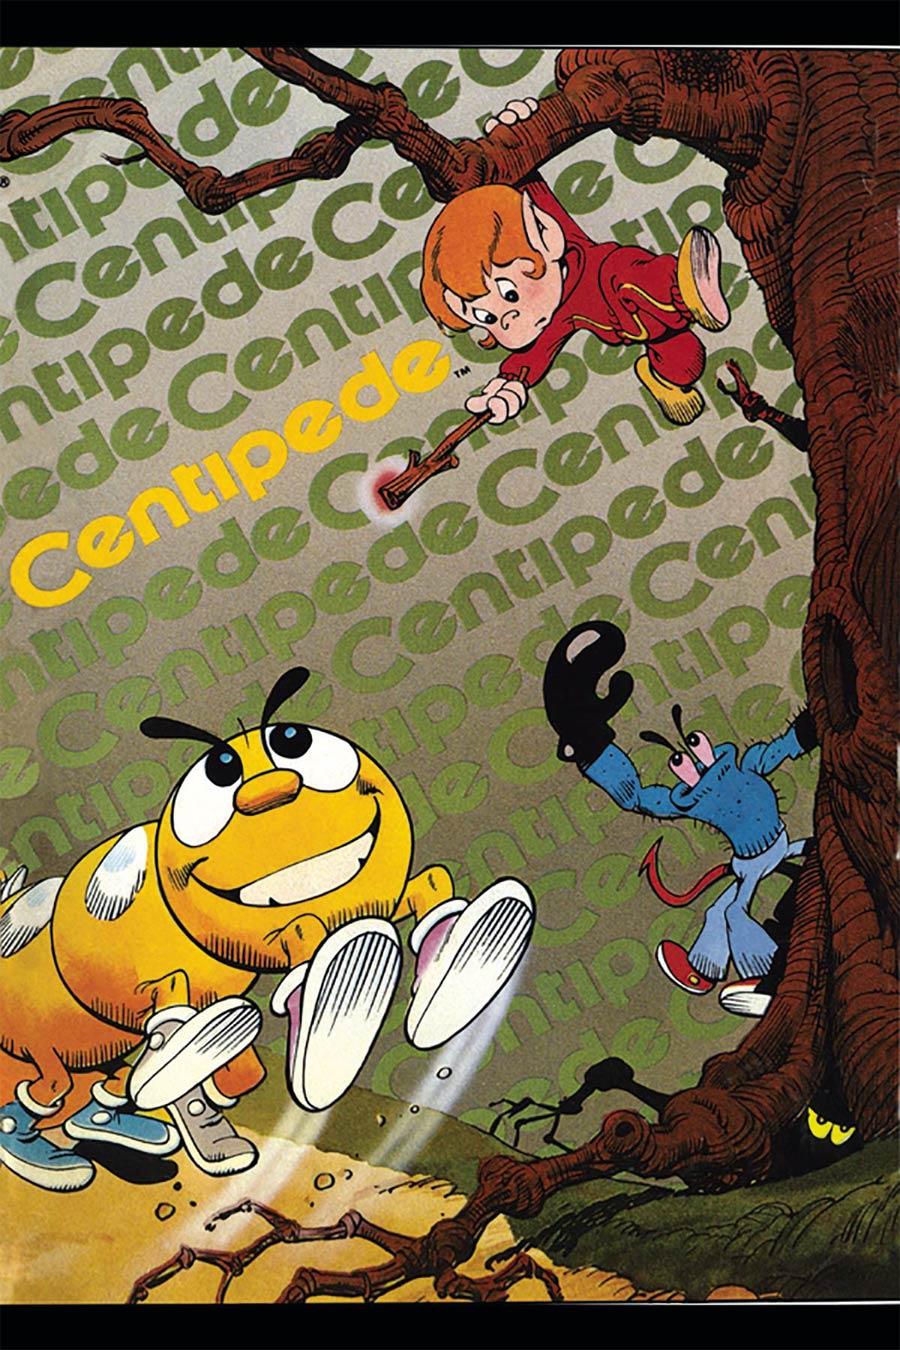 Centipede Classic Atari Mini-Comic Remastered